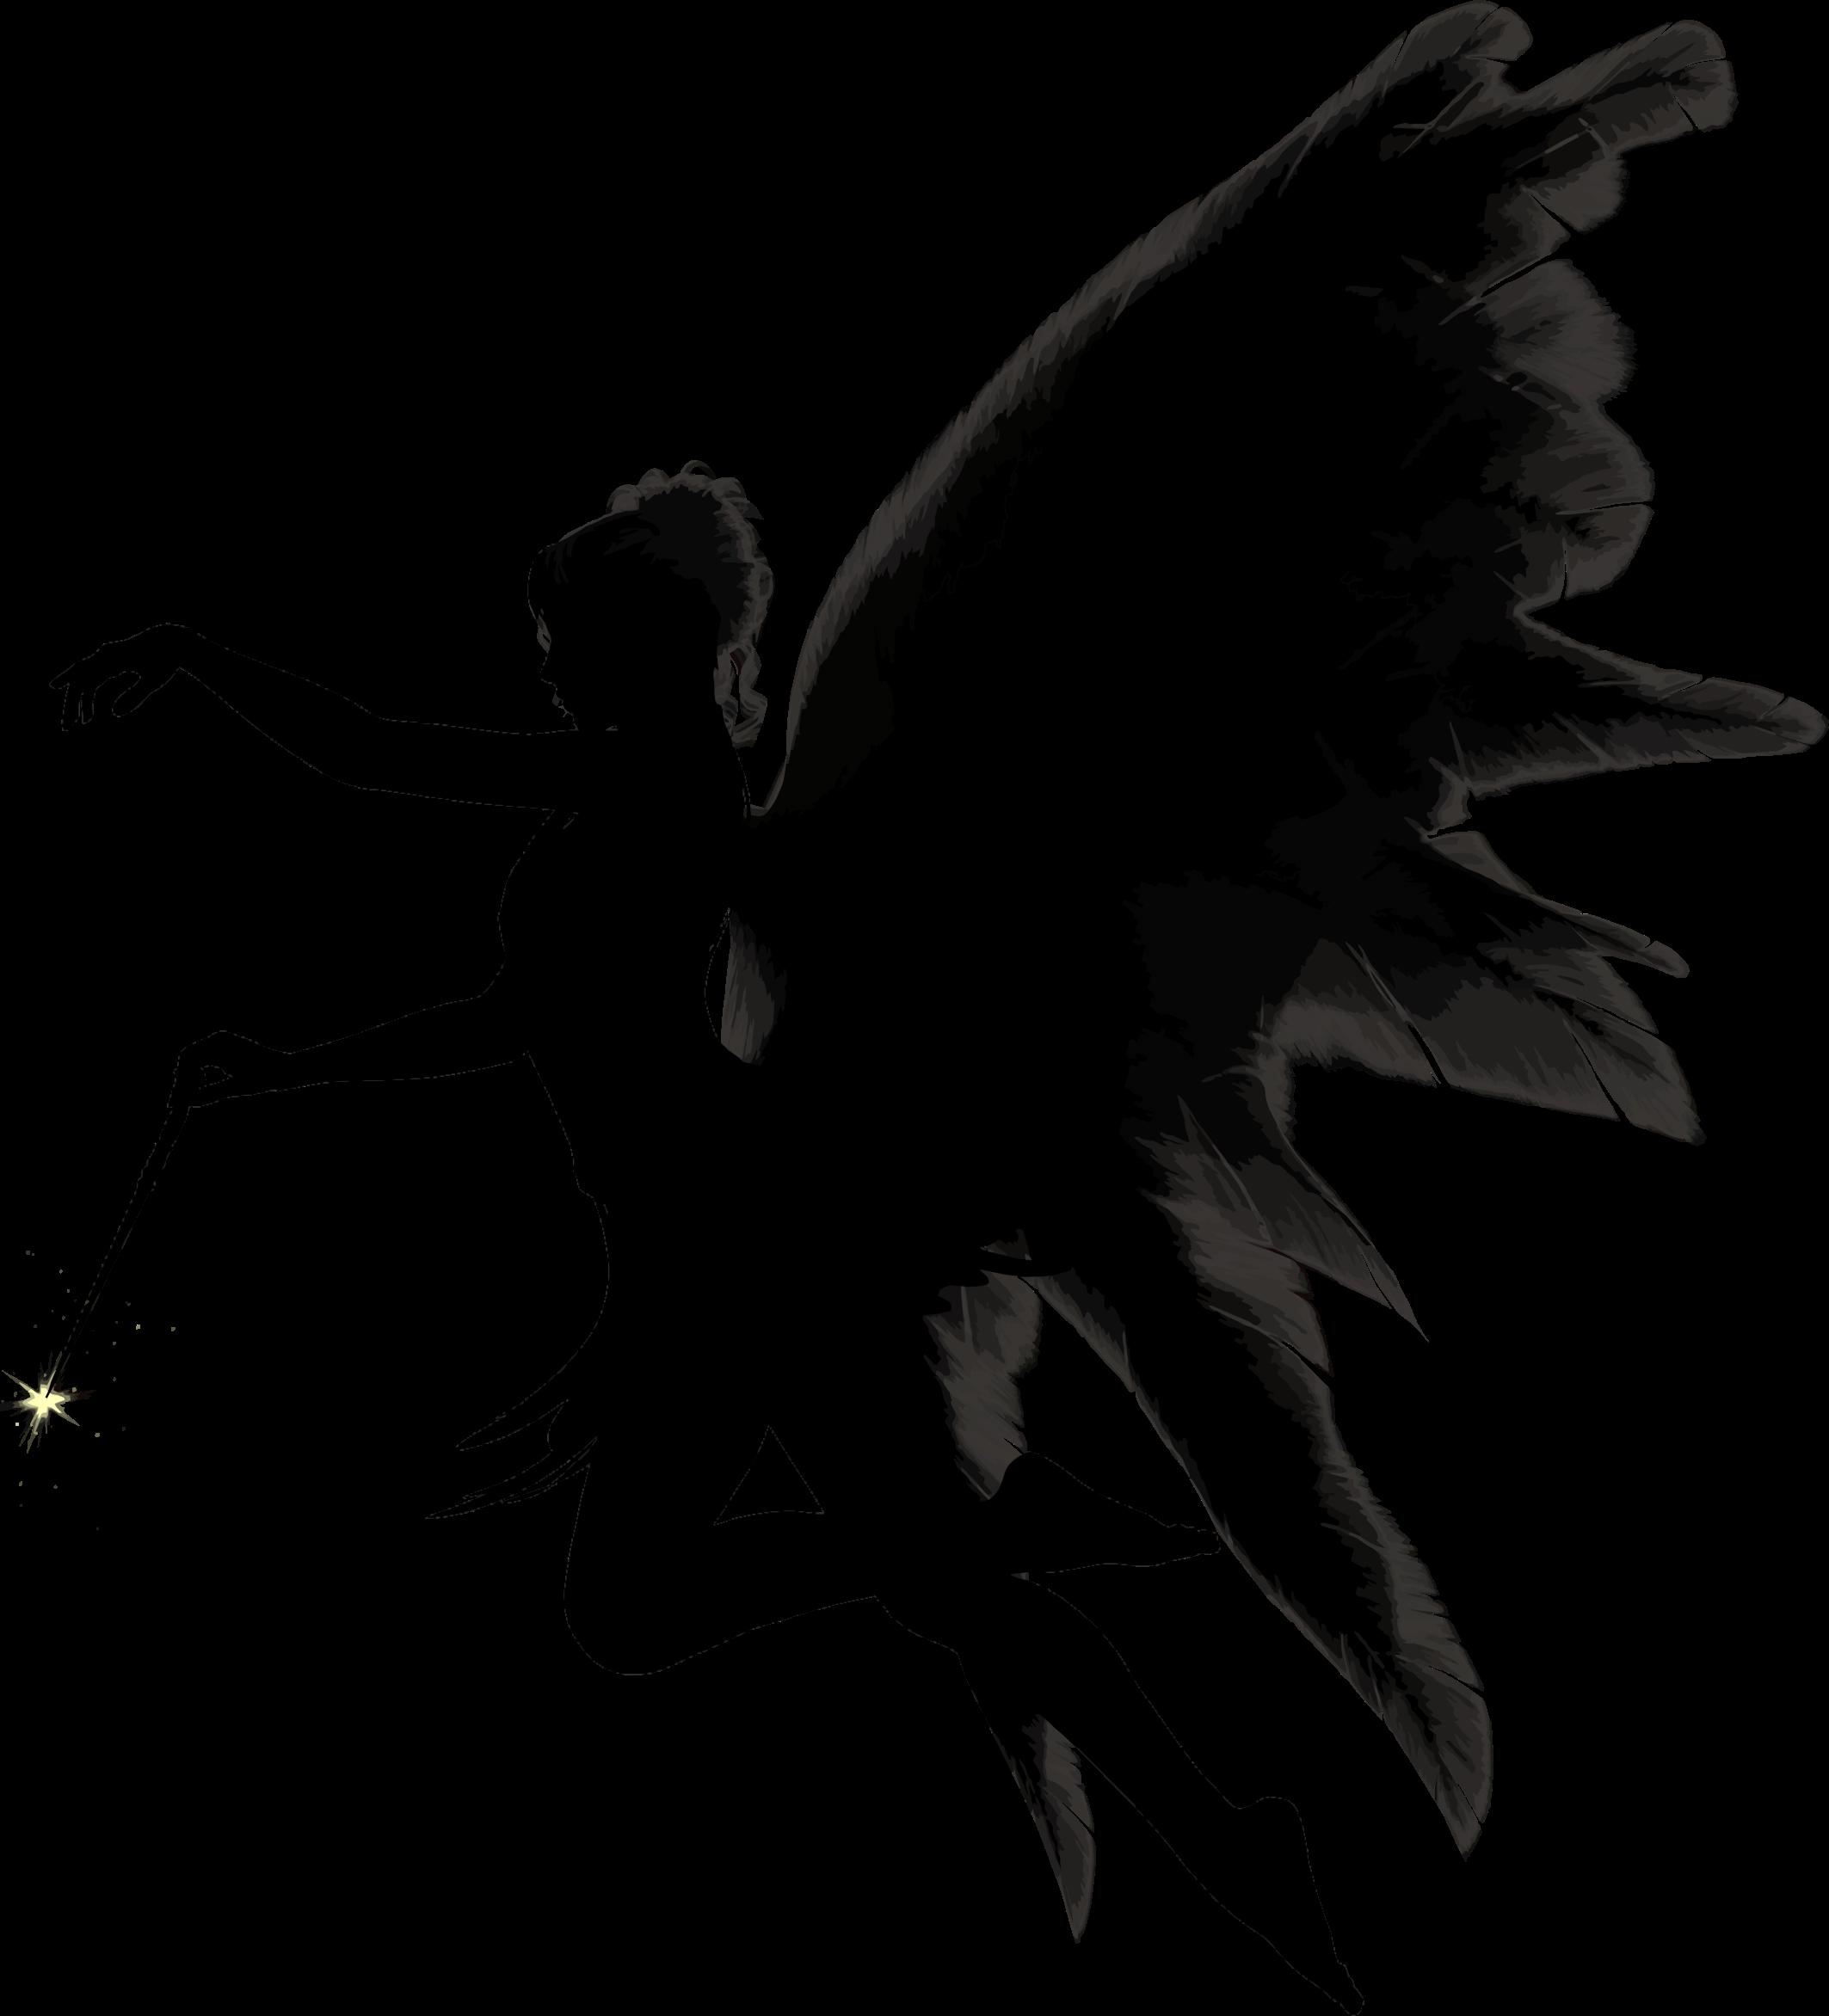 clipart angel silhouette dallas cowboys logo pics cowboys logo pictures